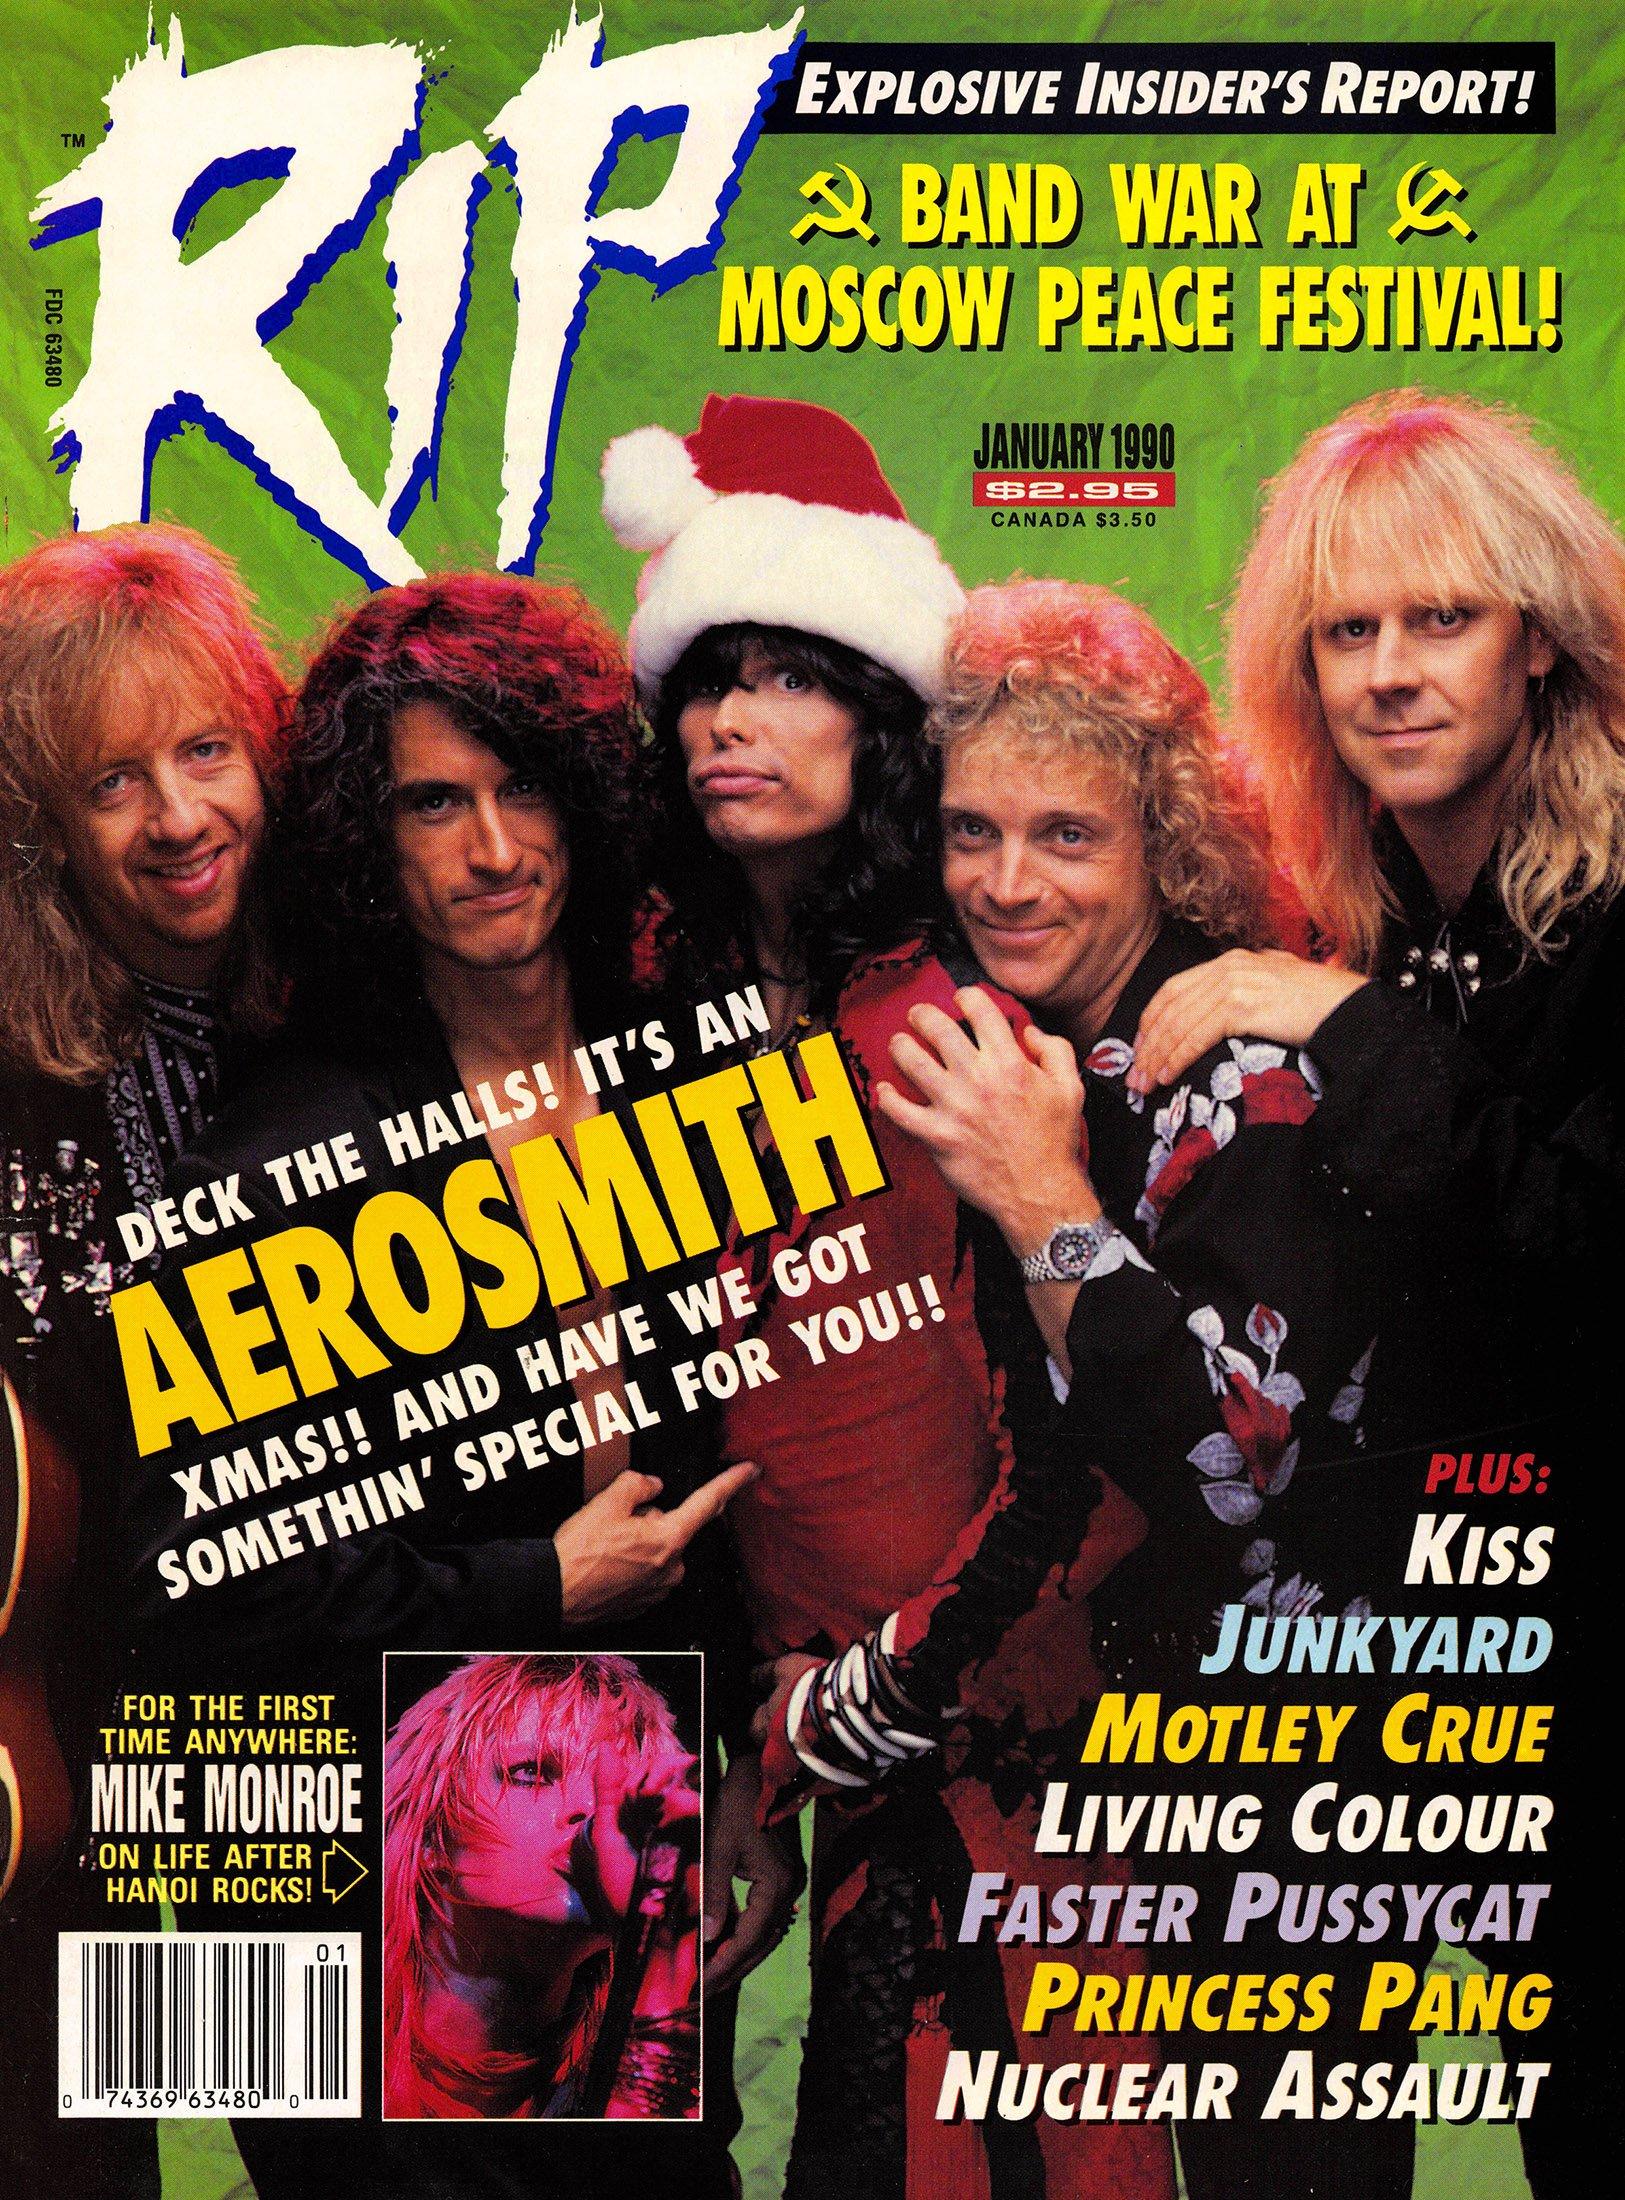 RIP Volume 4, Number 2 (January 1990)